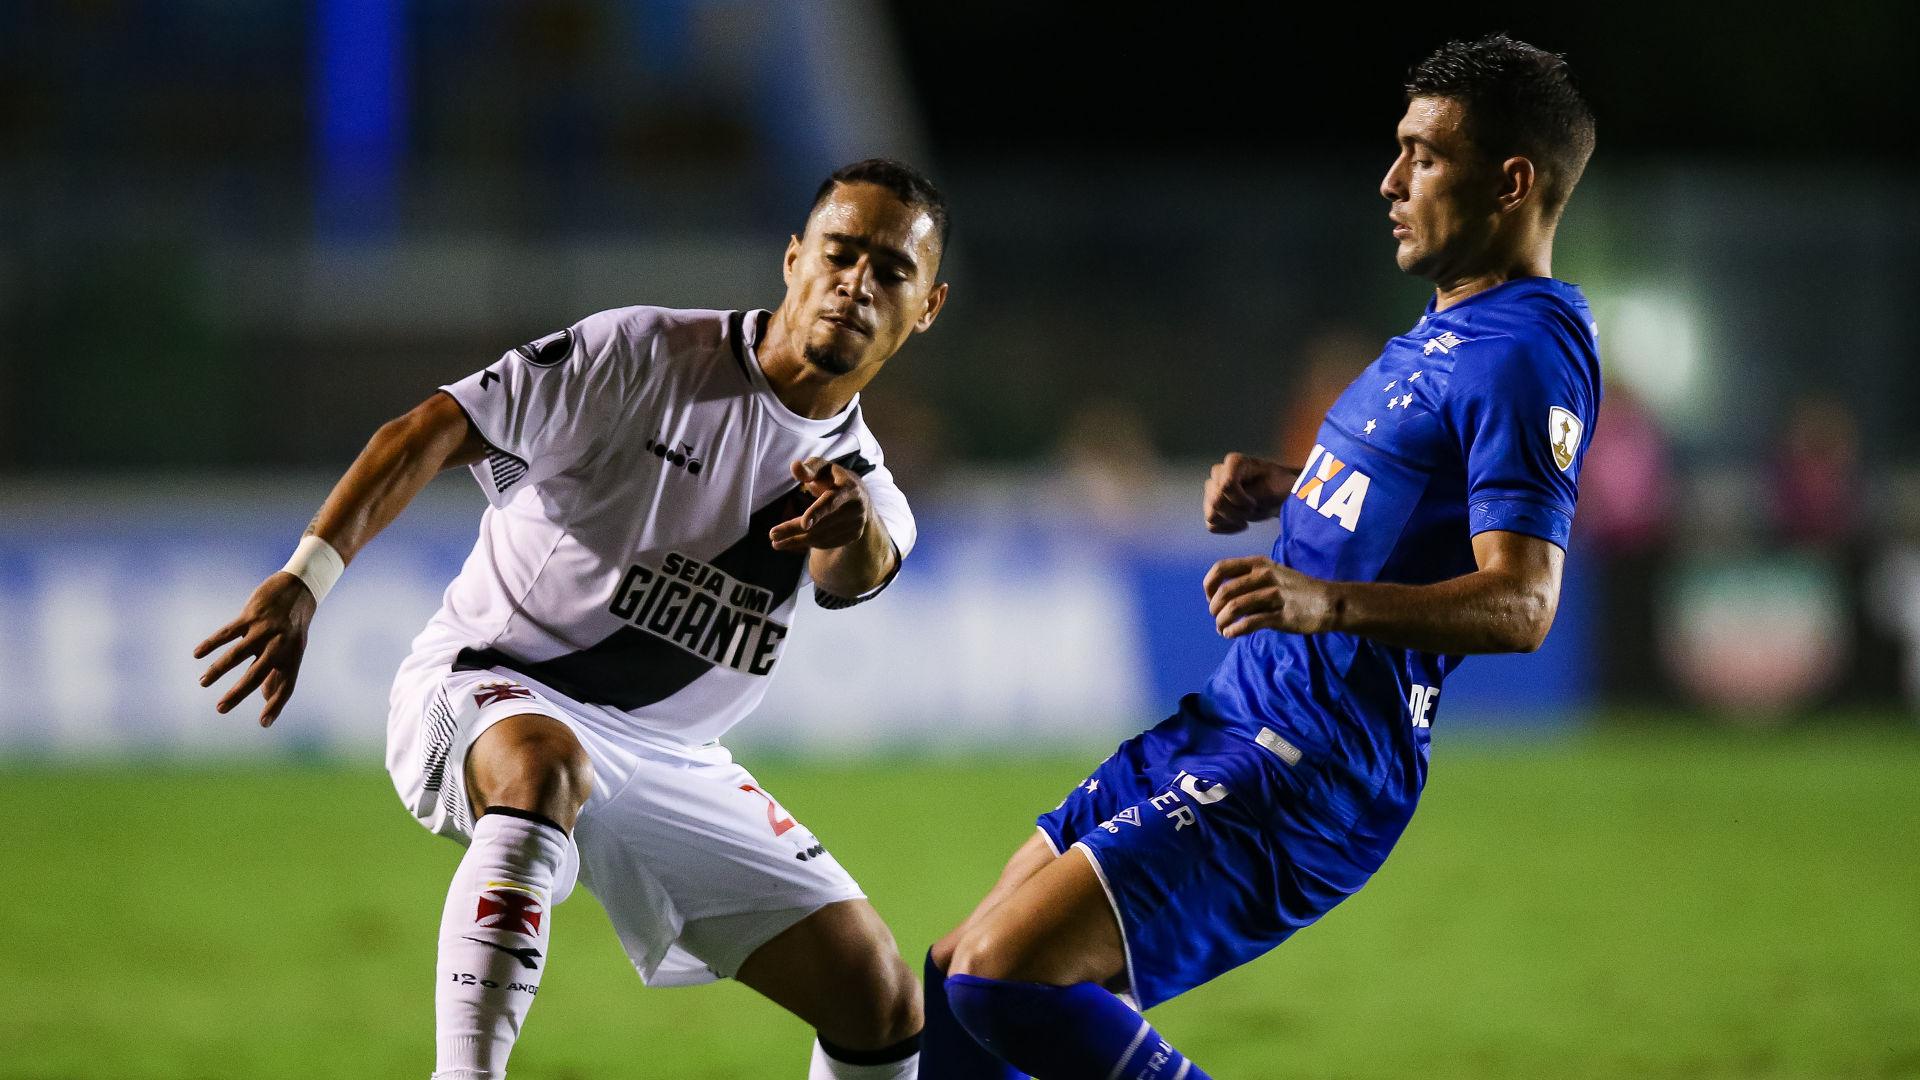 Yago Pikachu Arrascaeta Vasco Cruzeiro Libertadores 02052018